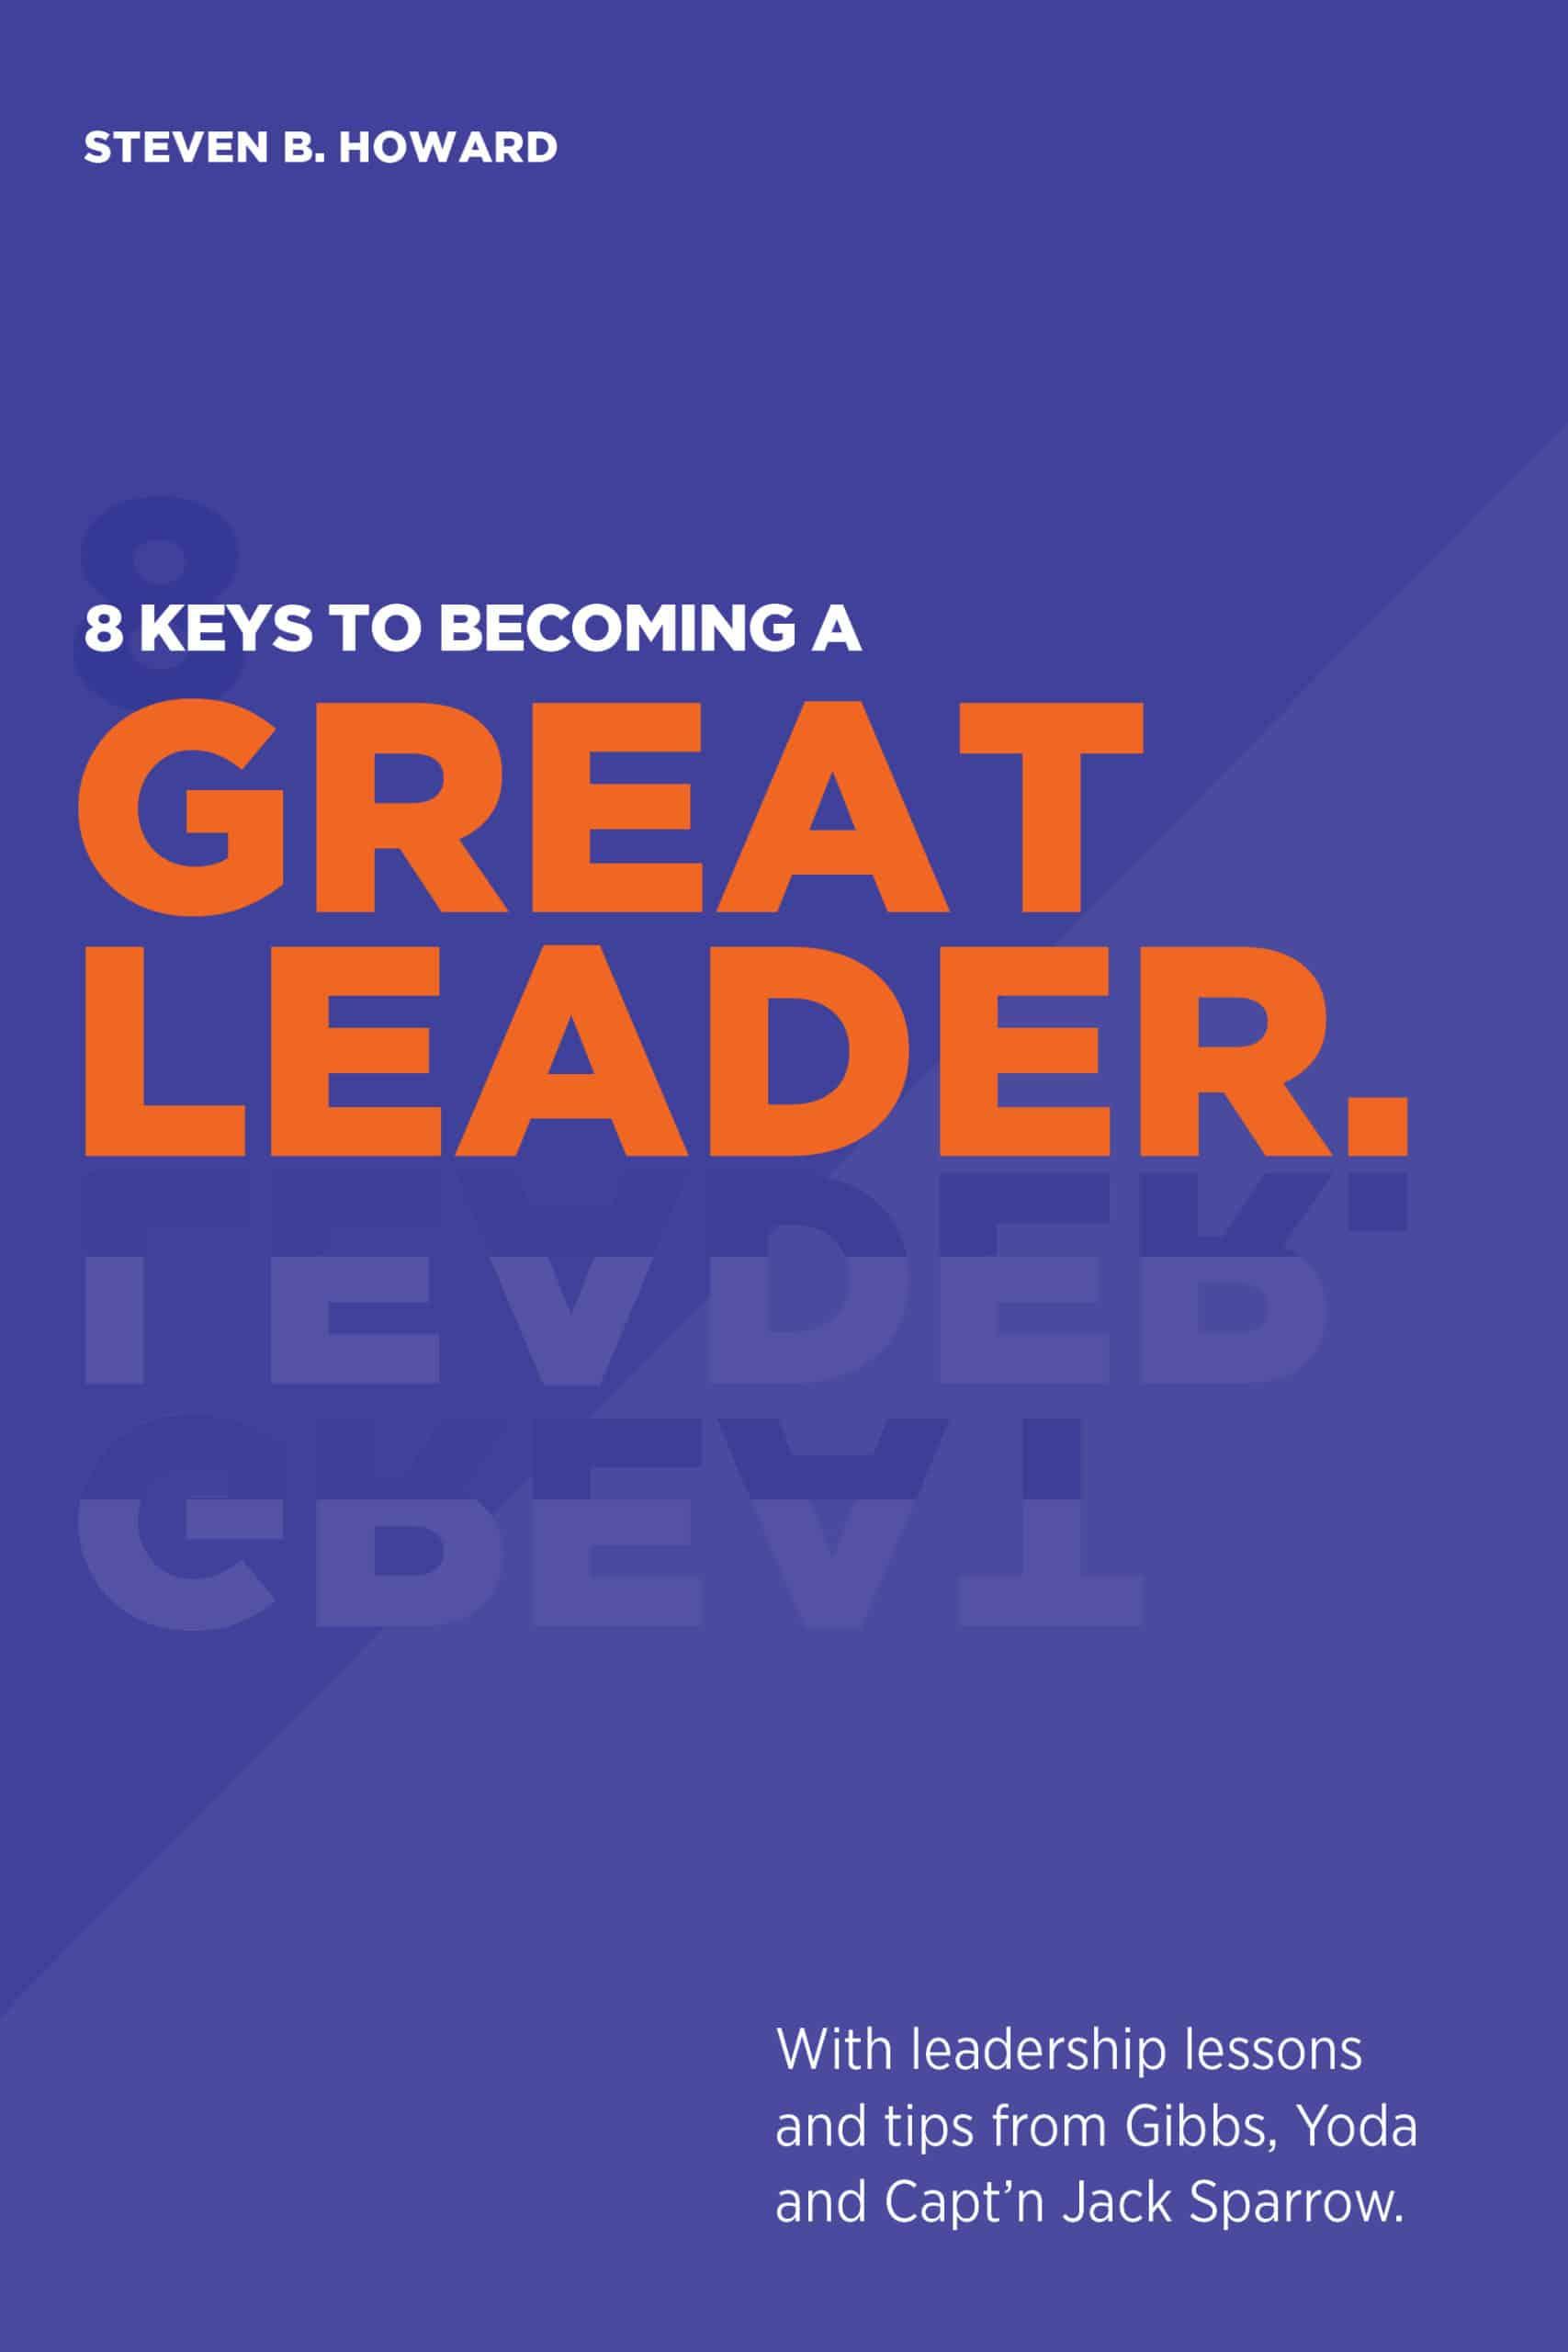 8 Keys to Great Leadership by Steven Howard